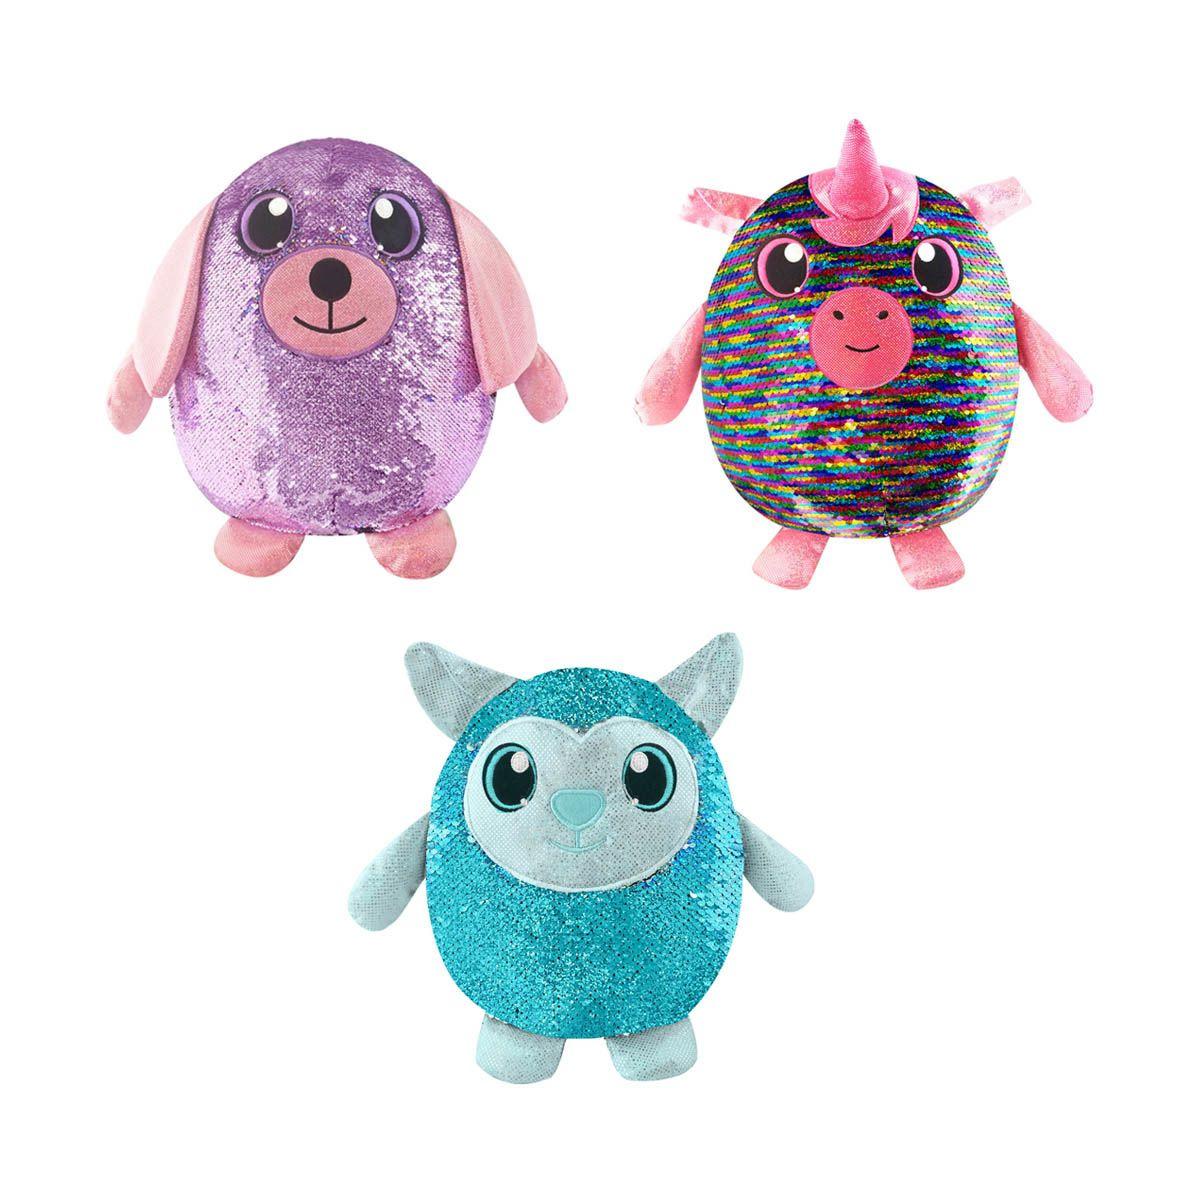 Shimmeez Plush Toy Assorted Kmart Trendy Purses Cute Purses Trending Handbag